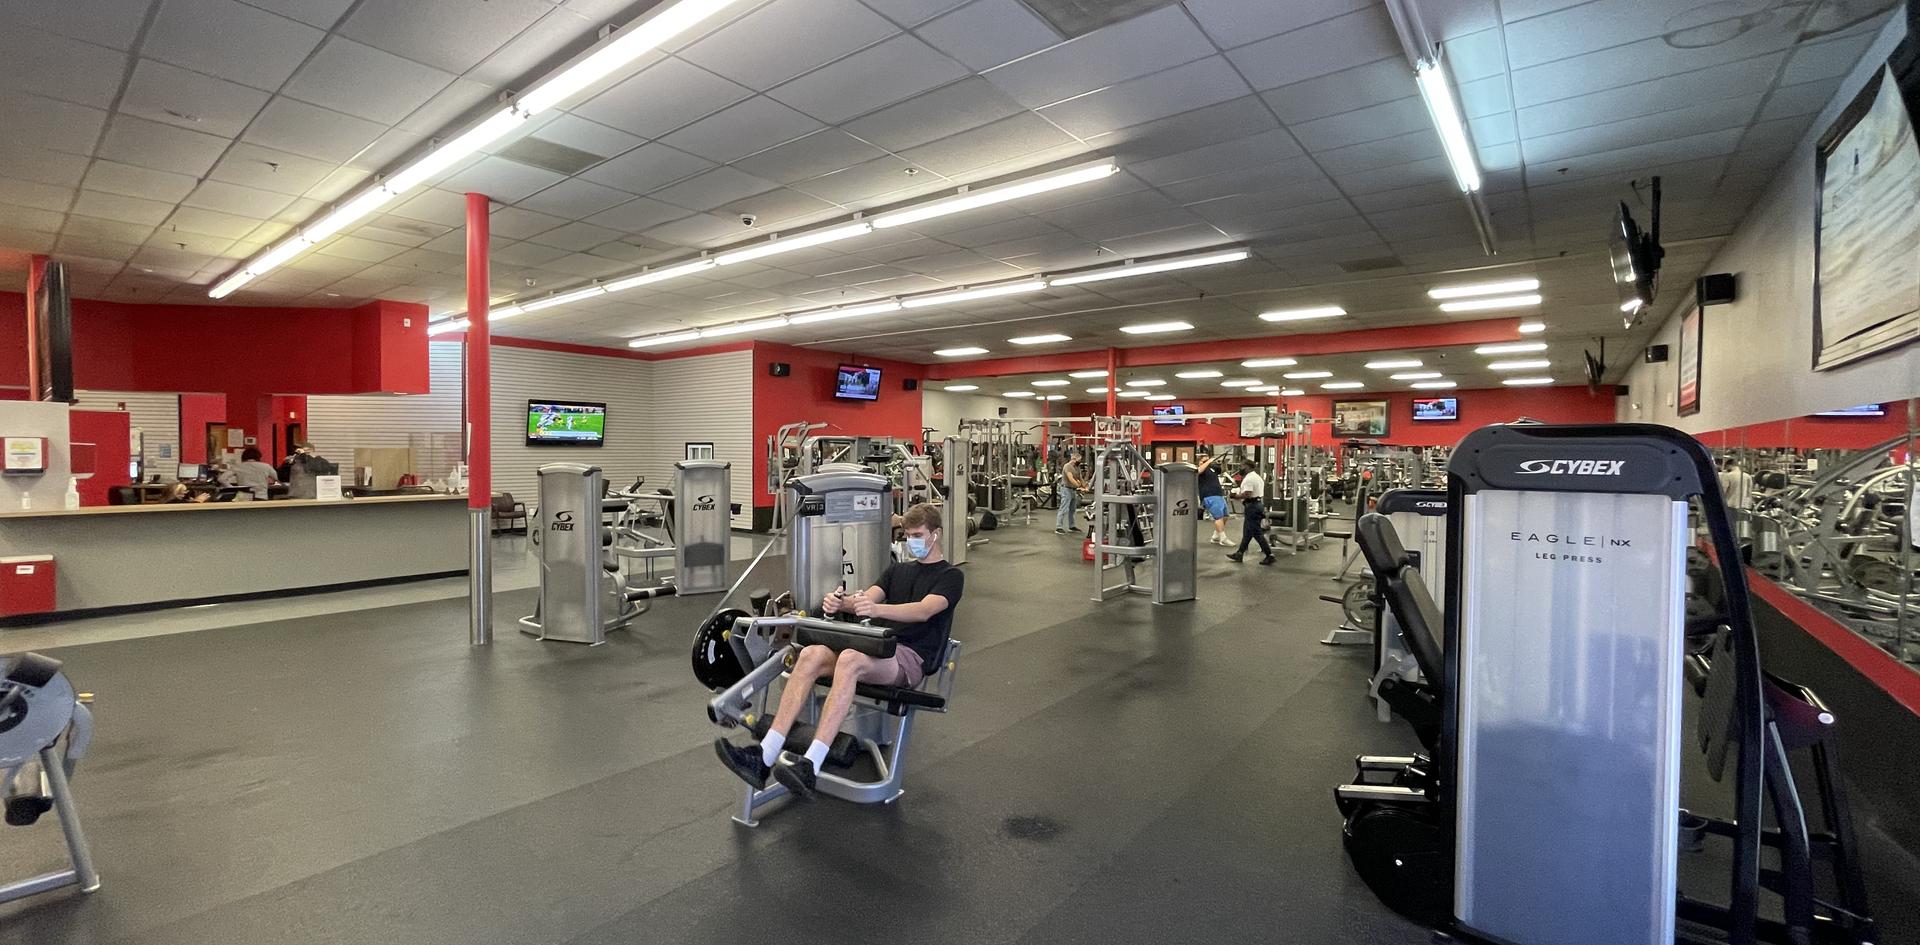 Life Fitness & Cybex machines